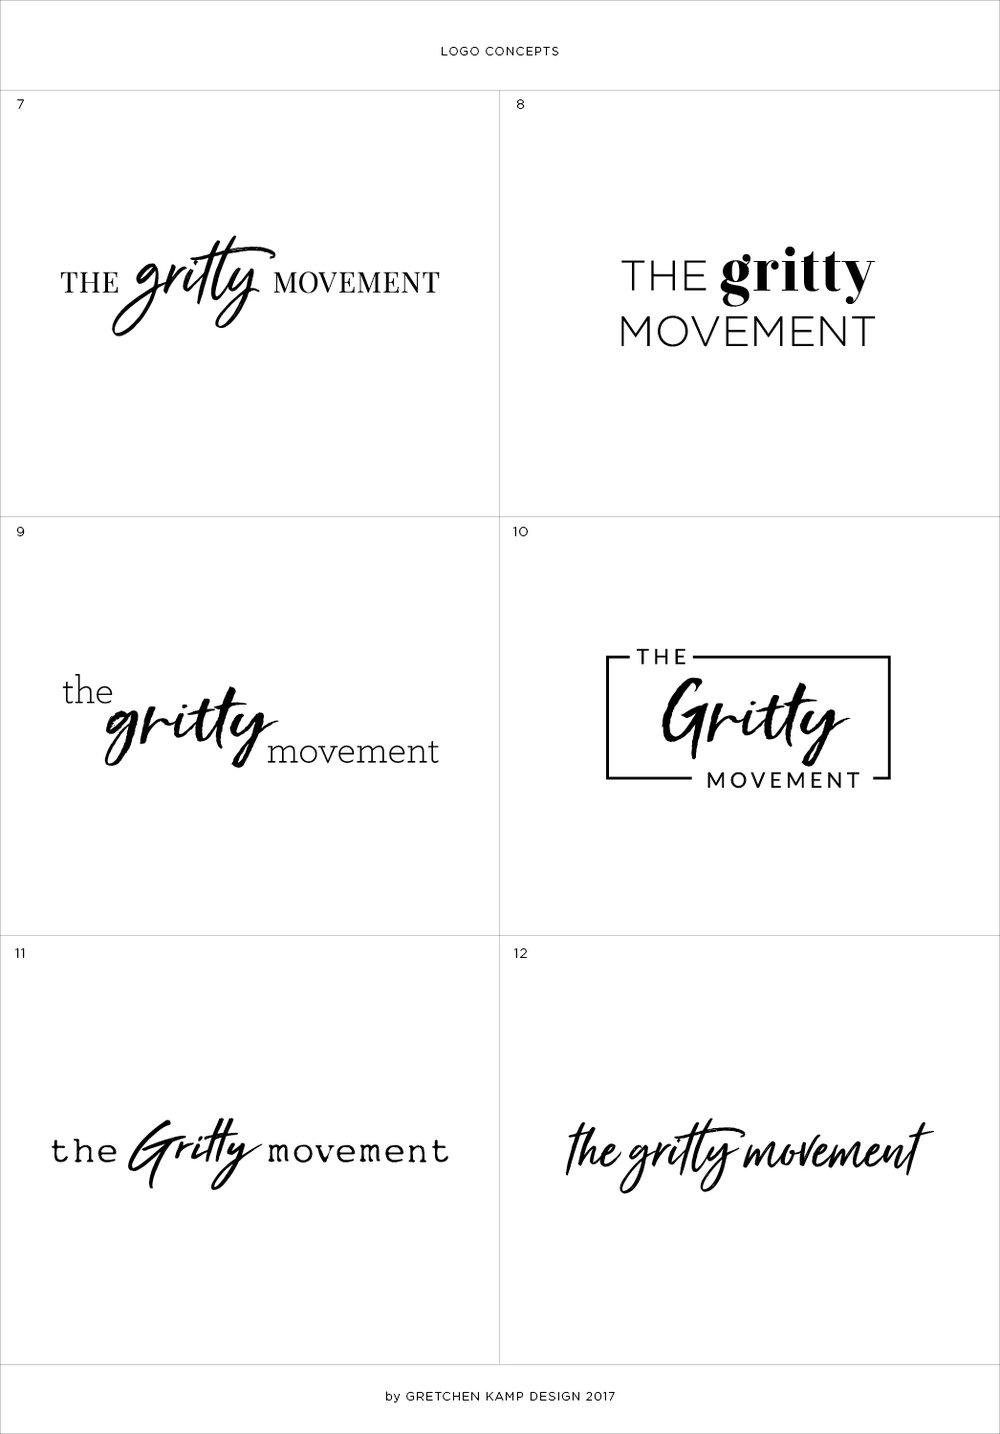 GrittyMovement_logos_v01b.jpg